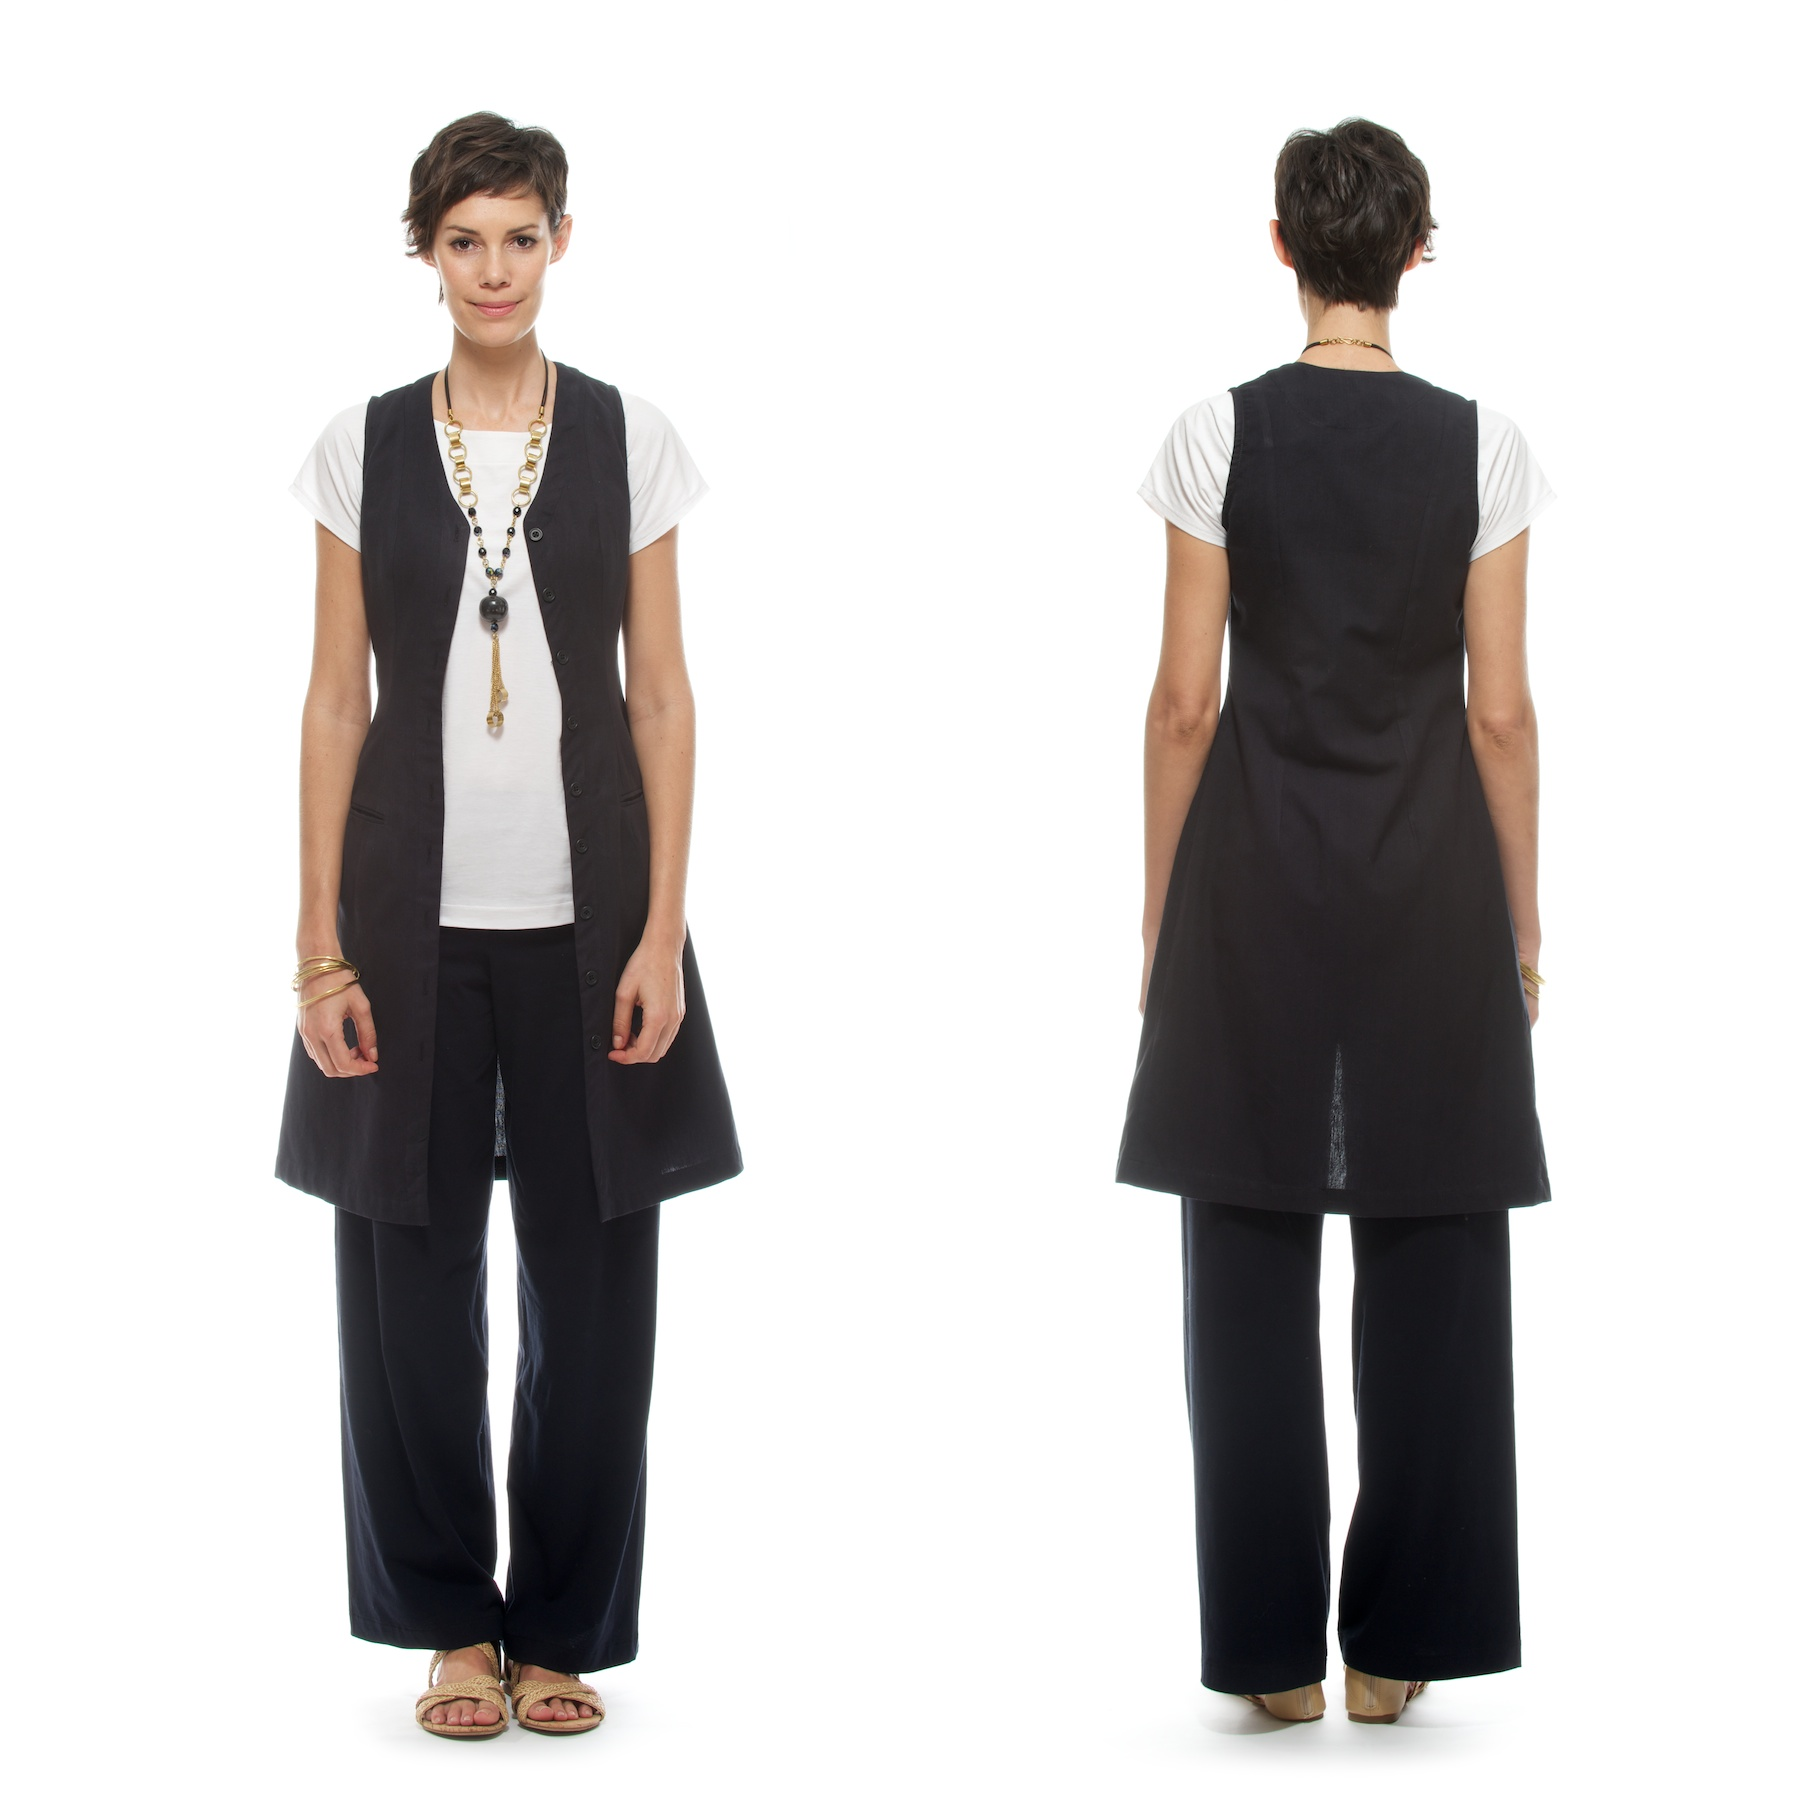 Rebecca Vest Dress with Veronica Pant.jpg